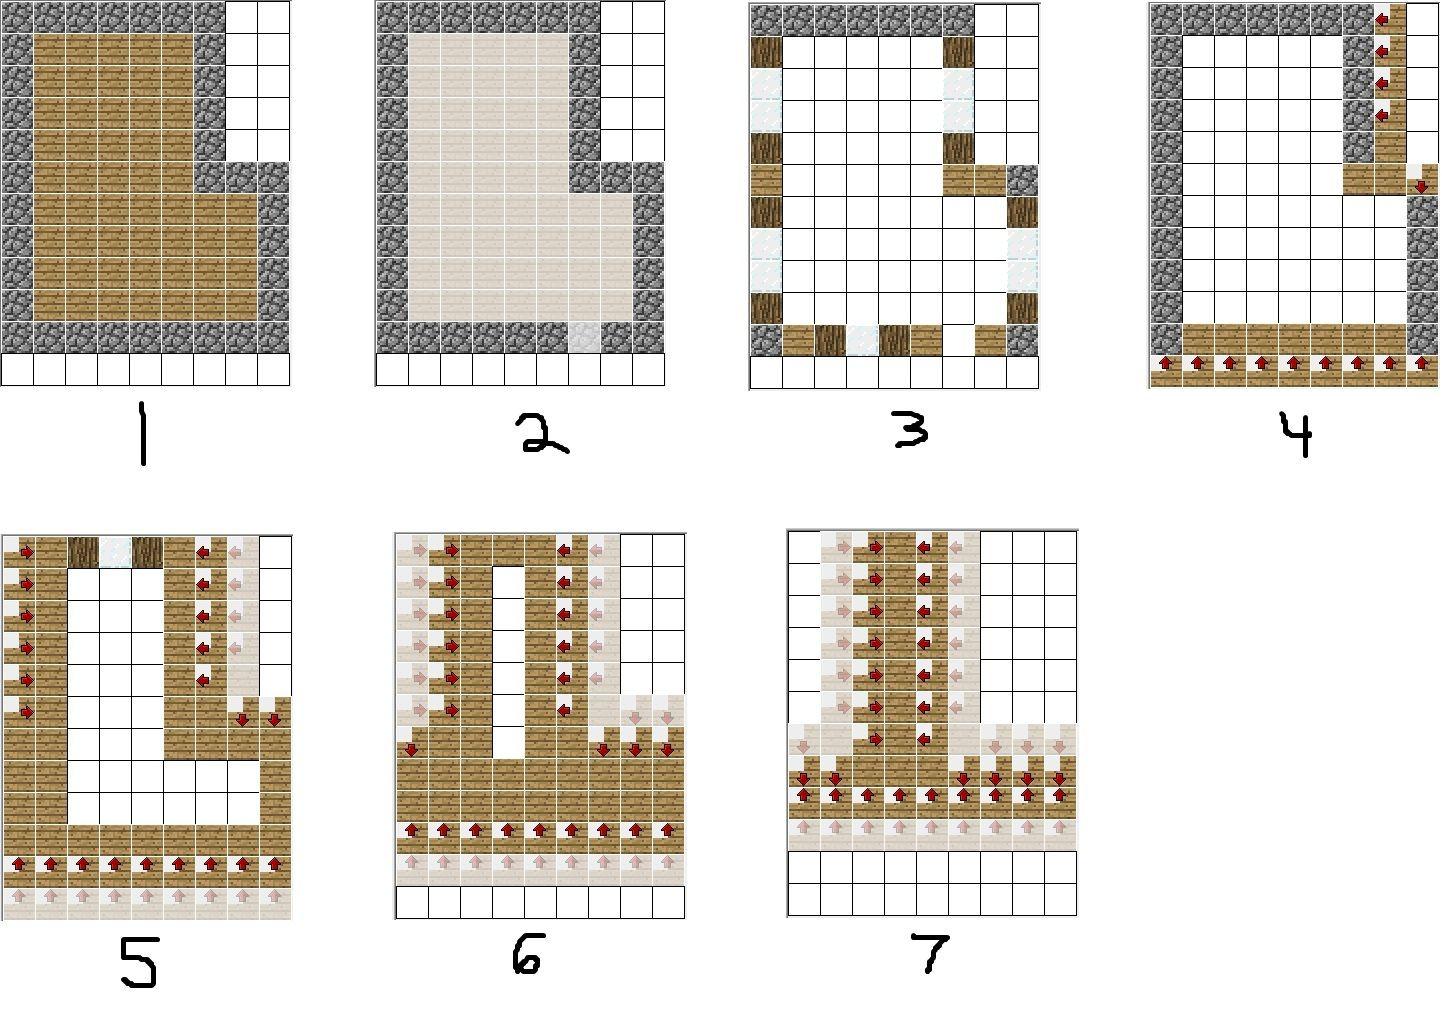 minecraft village blueprints 10 | Minecraft | Pinterest | Minecraft ... for Minecraft Farmhouse Blueprints  1lp1fsj